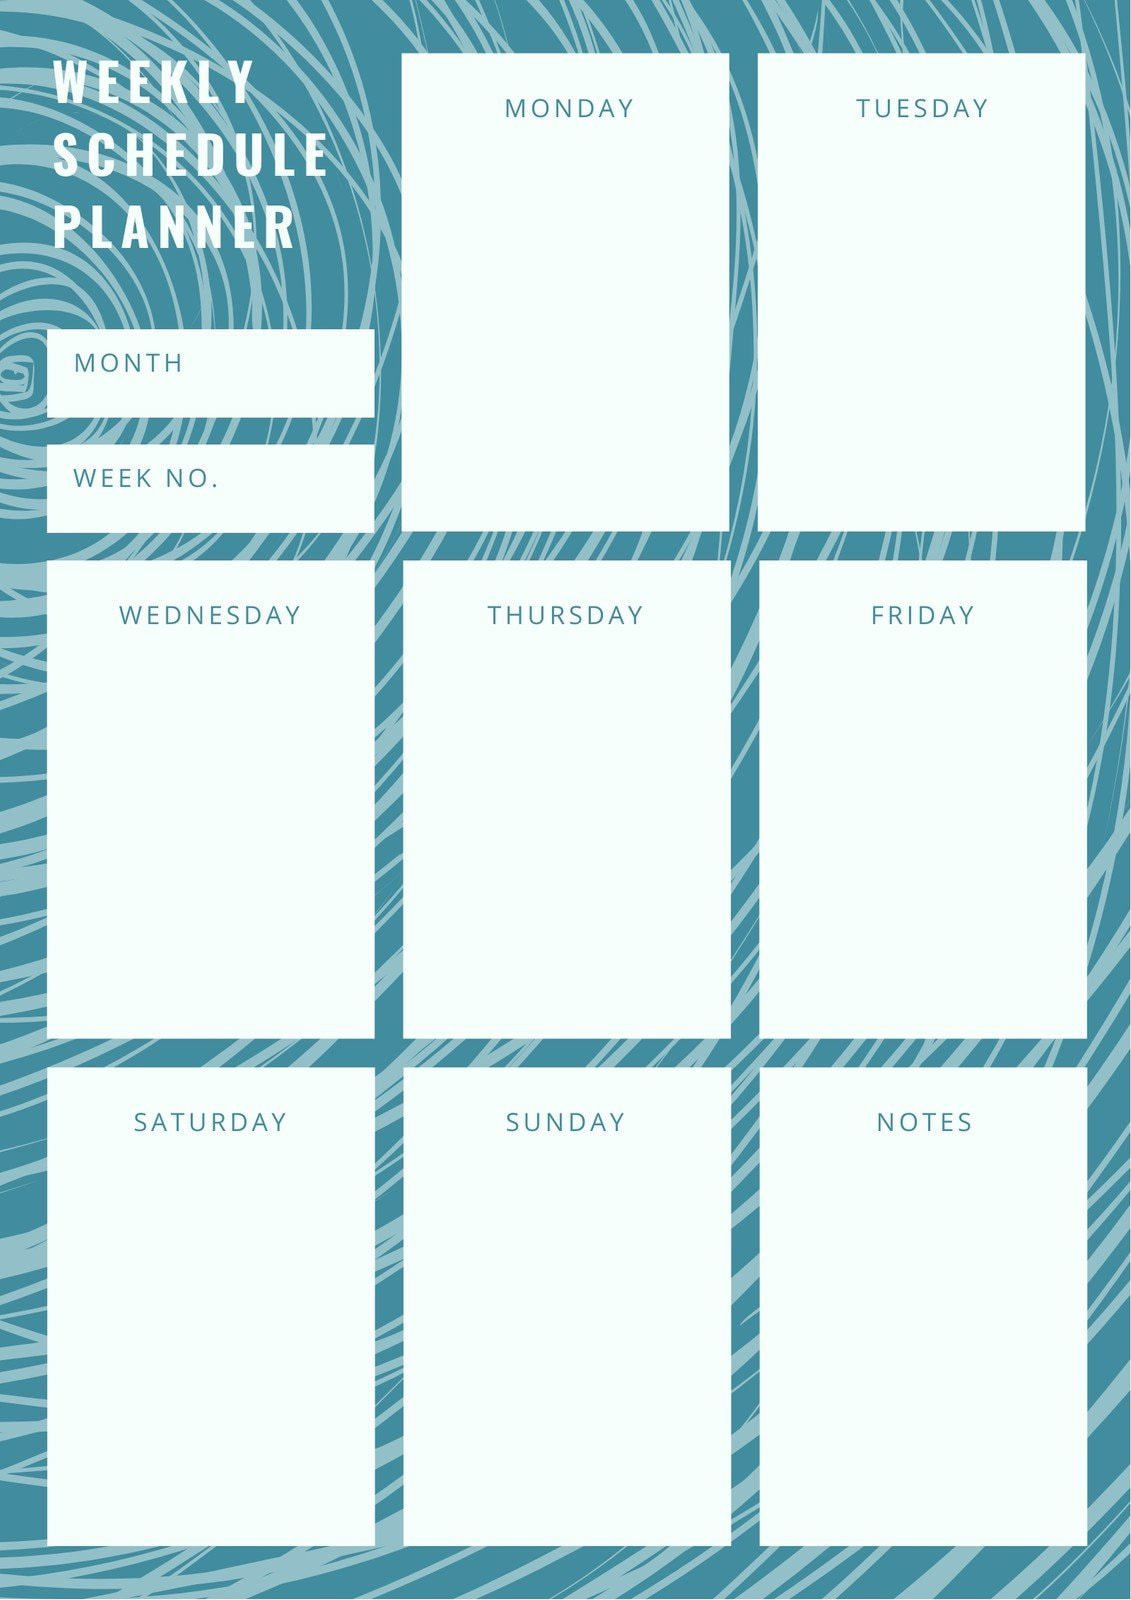 Blue Wave Pattern Weekly Schedule Planner